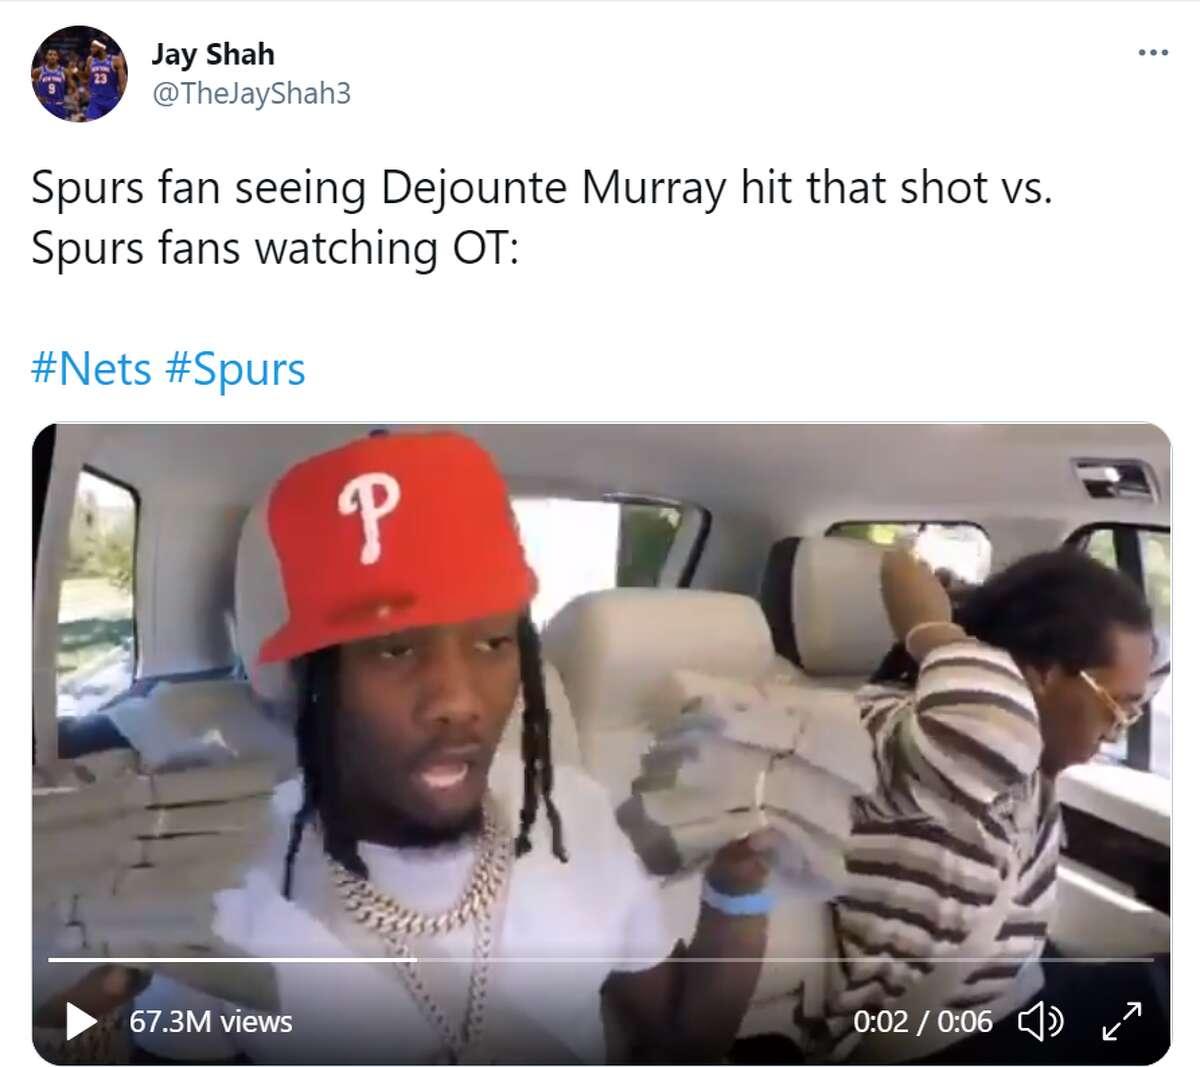 @TheJayyShah3: Spurs fan seeing Dejounte Murray hit that shot...